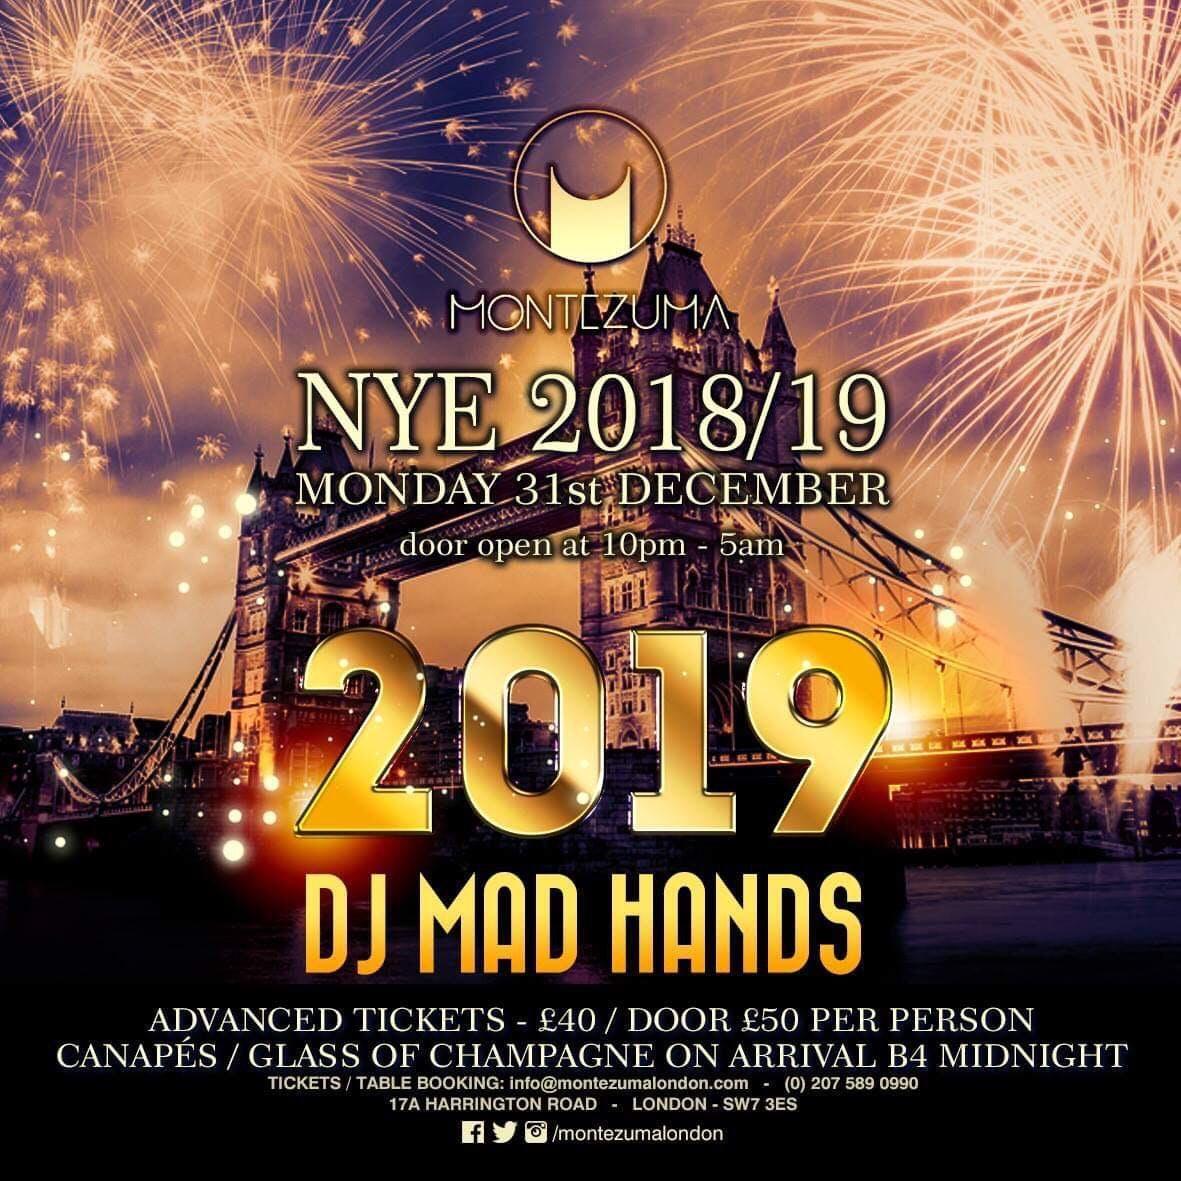 Montezuma New Years Eve 2018 - 2019